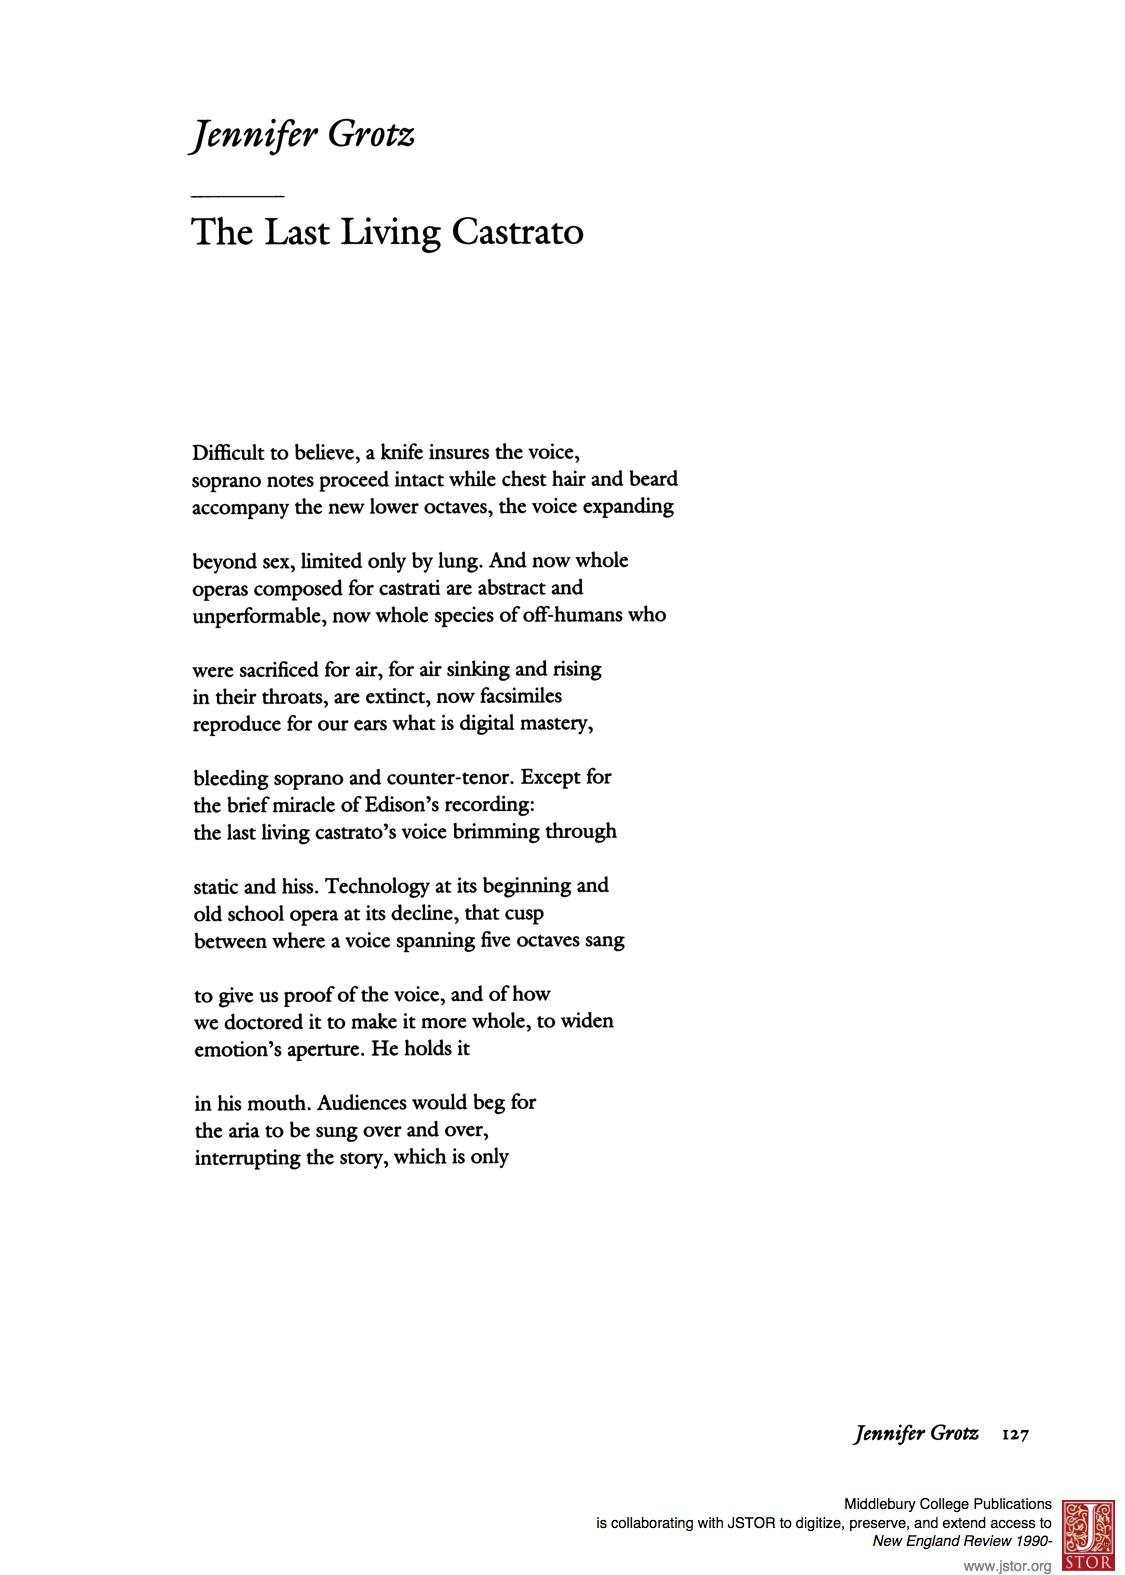 LastLivingCastrato